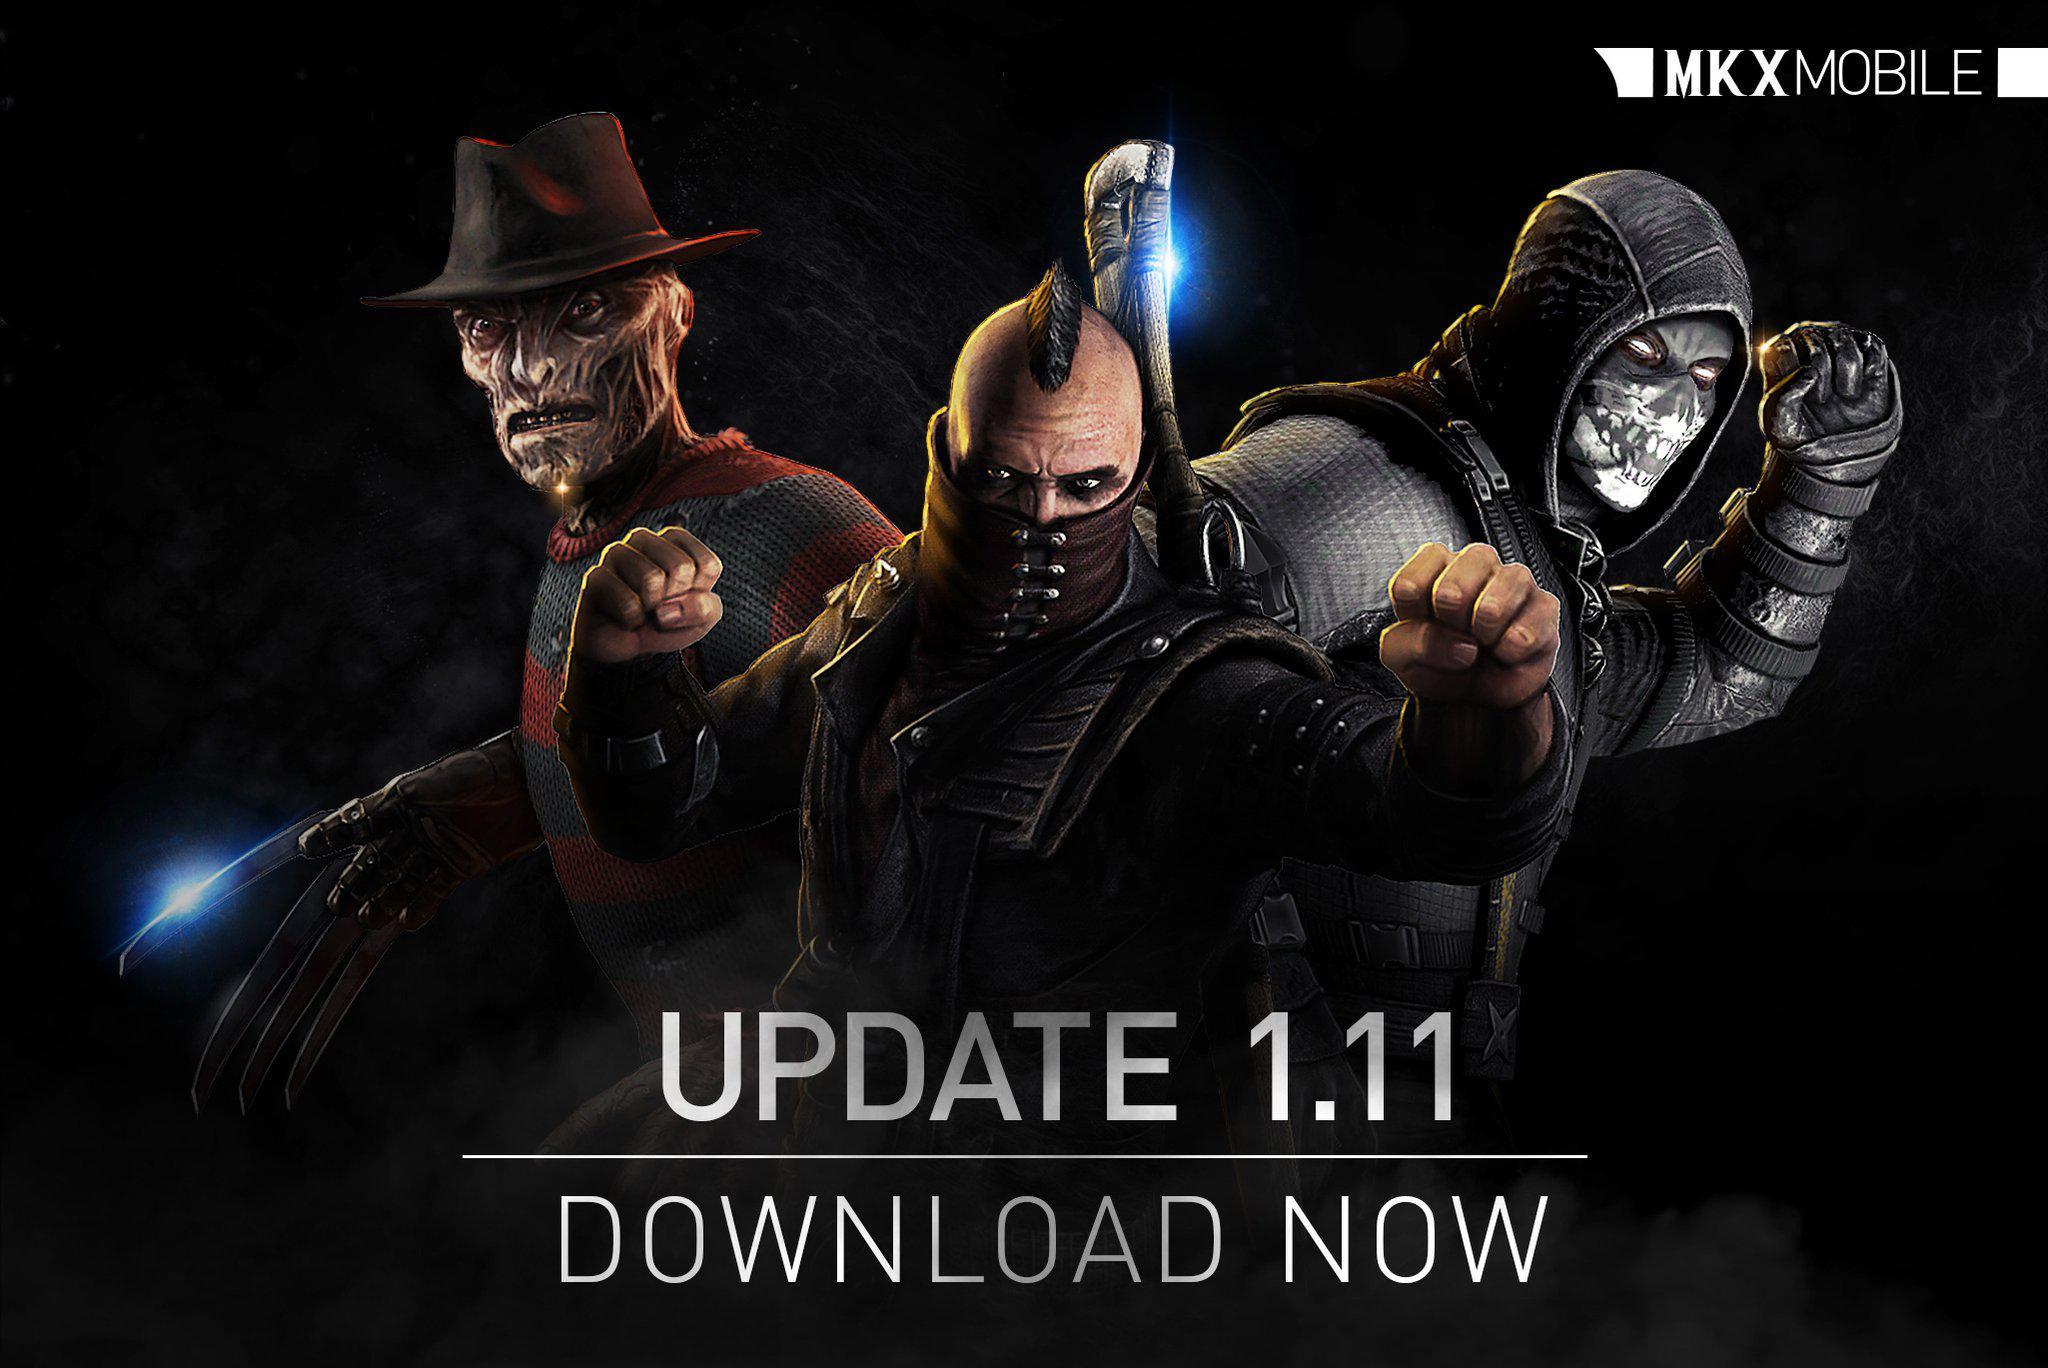 Mortal Kombat Online - Mortal Kombat X - MKX Mobile Adds Shao Kahn